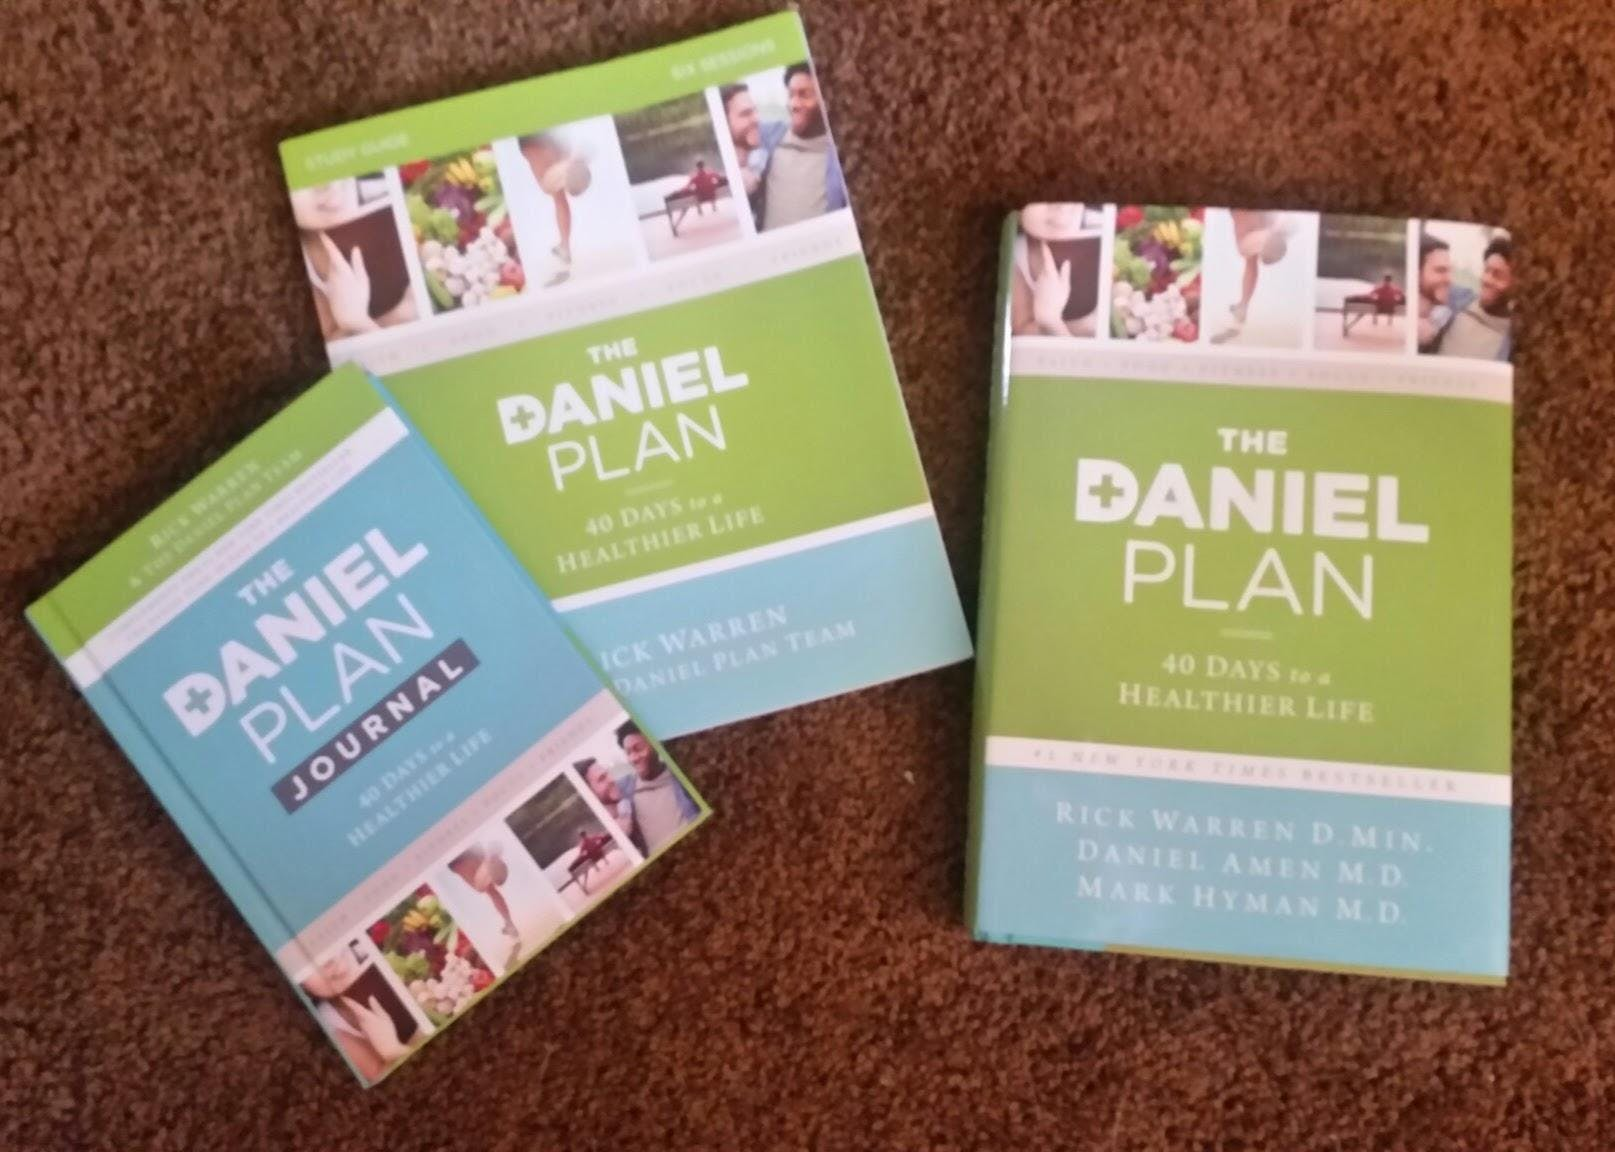 The Daniel Plan - 40 Days to a Healthier Life